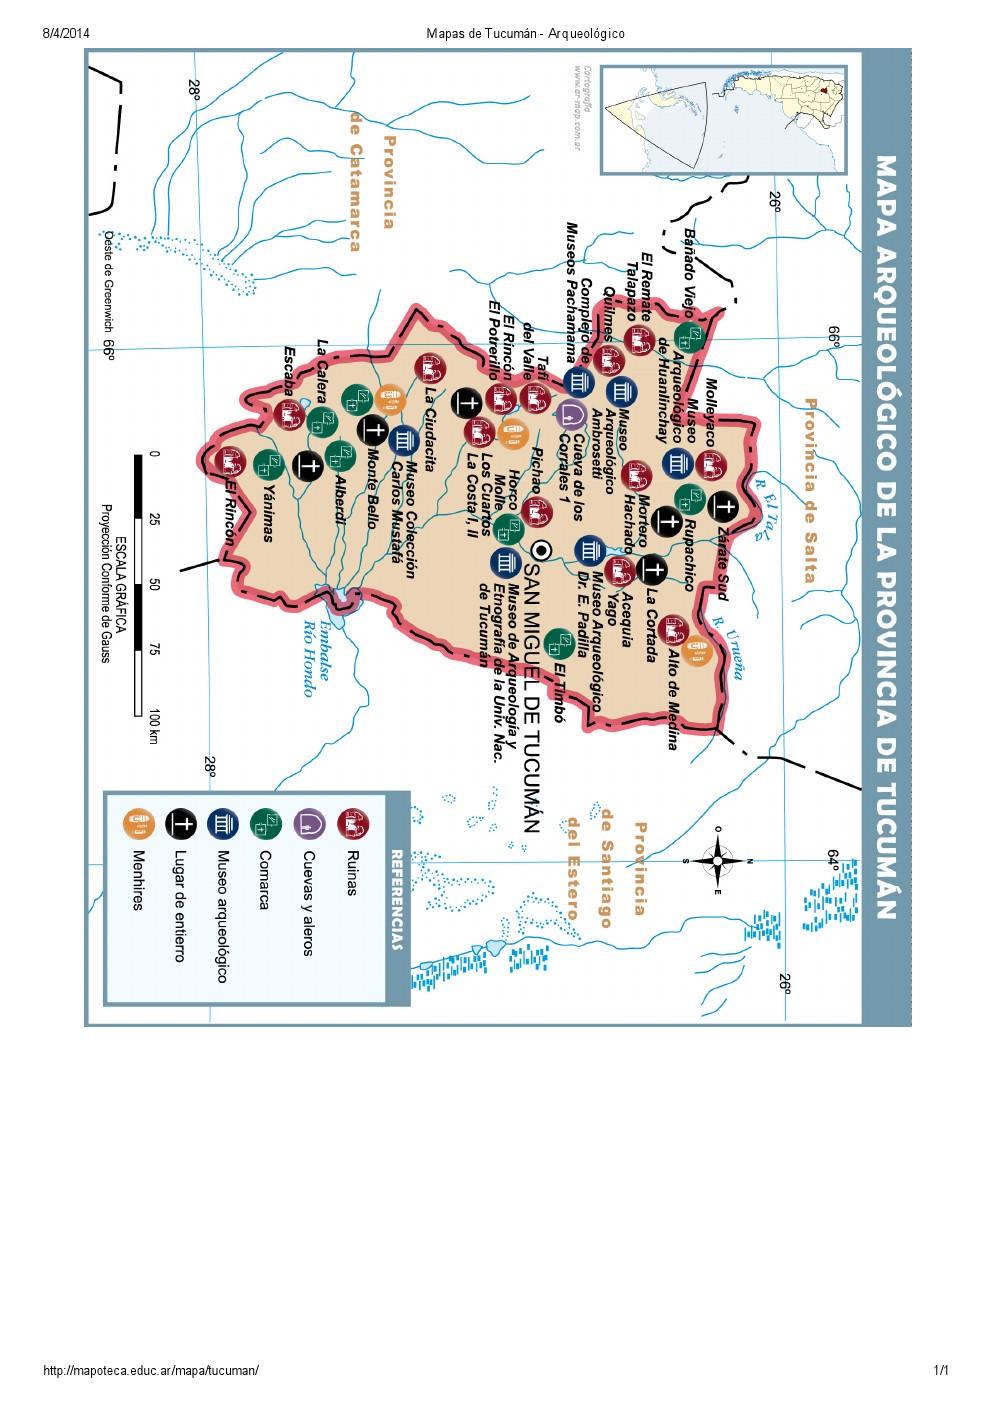 Mapa arqueológico de Tucumán. Mapoteca de Educ.ar